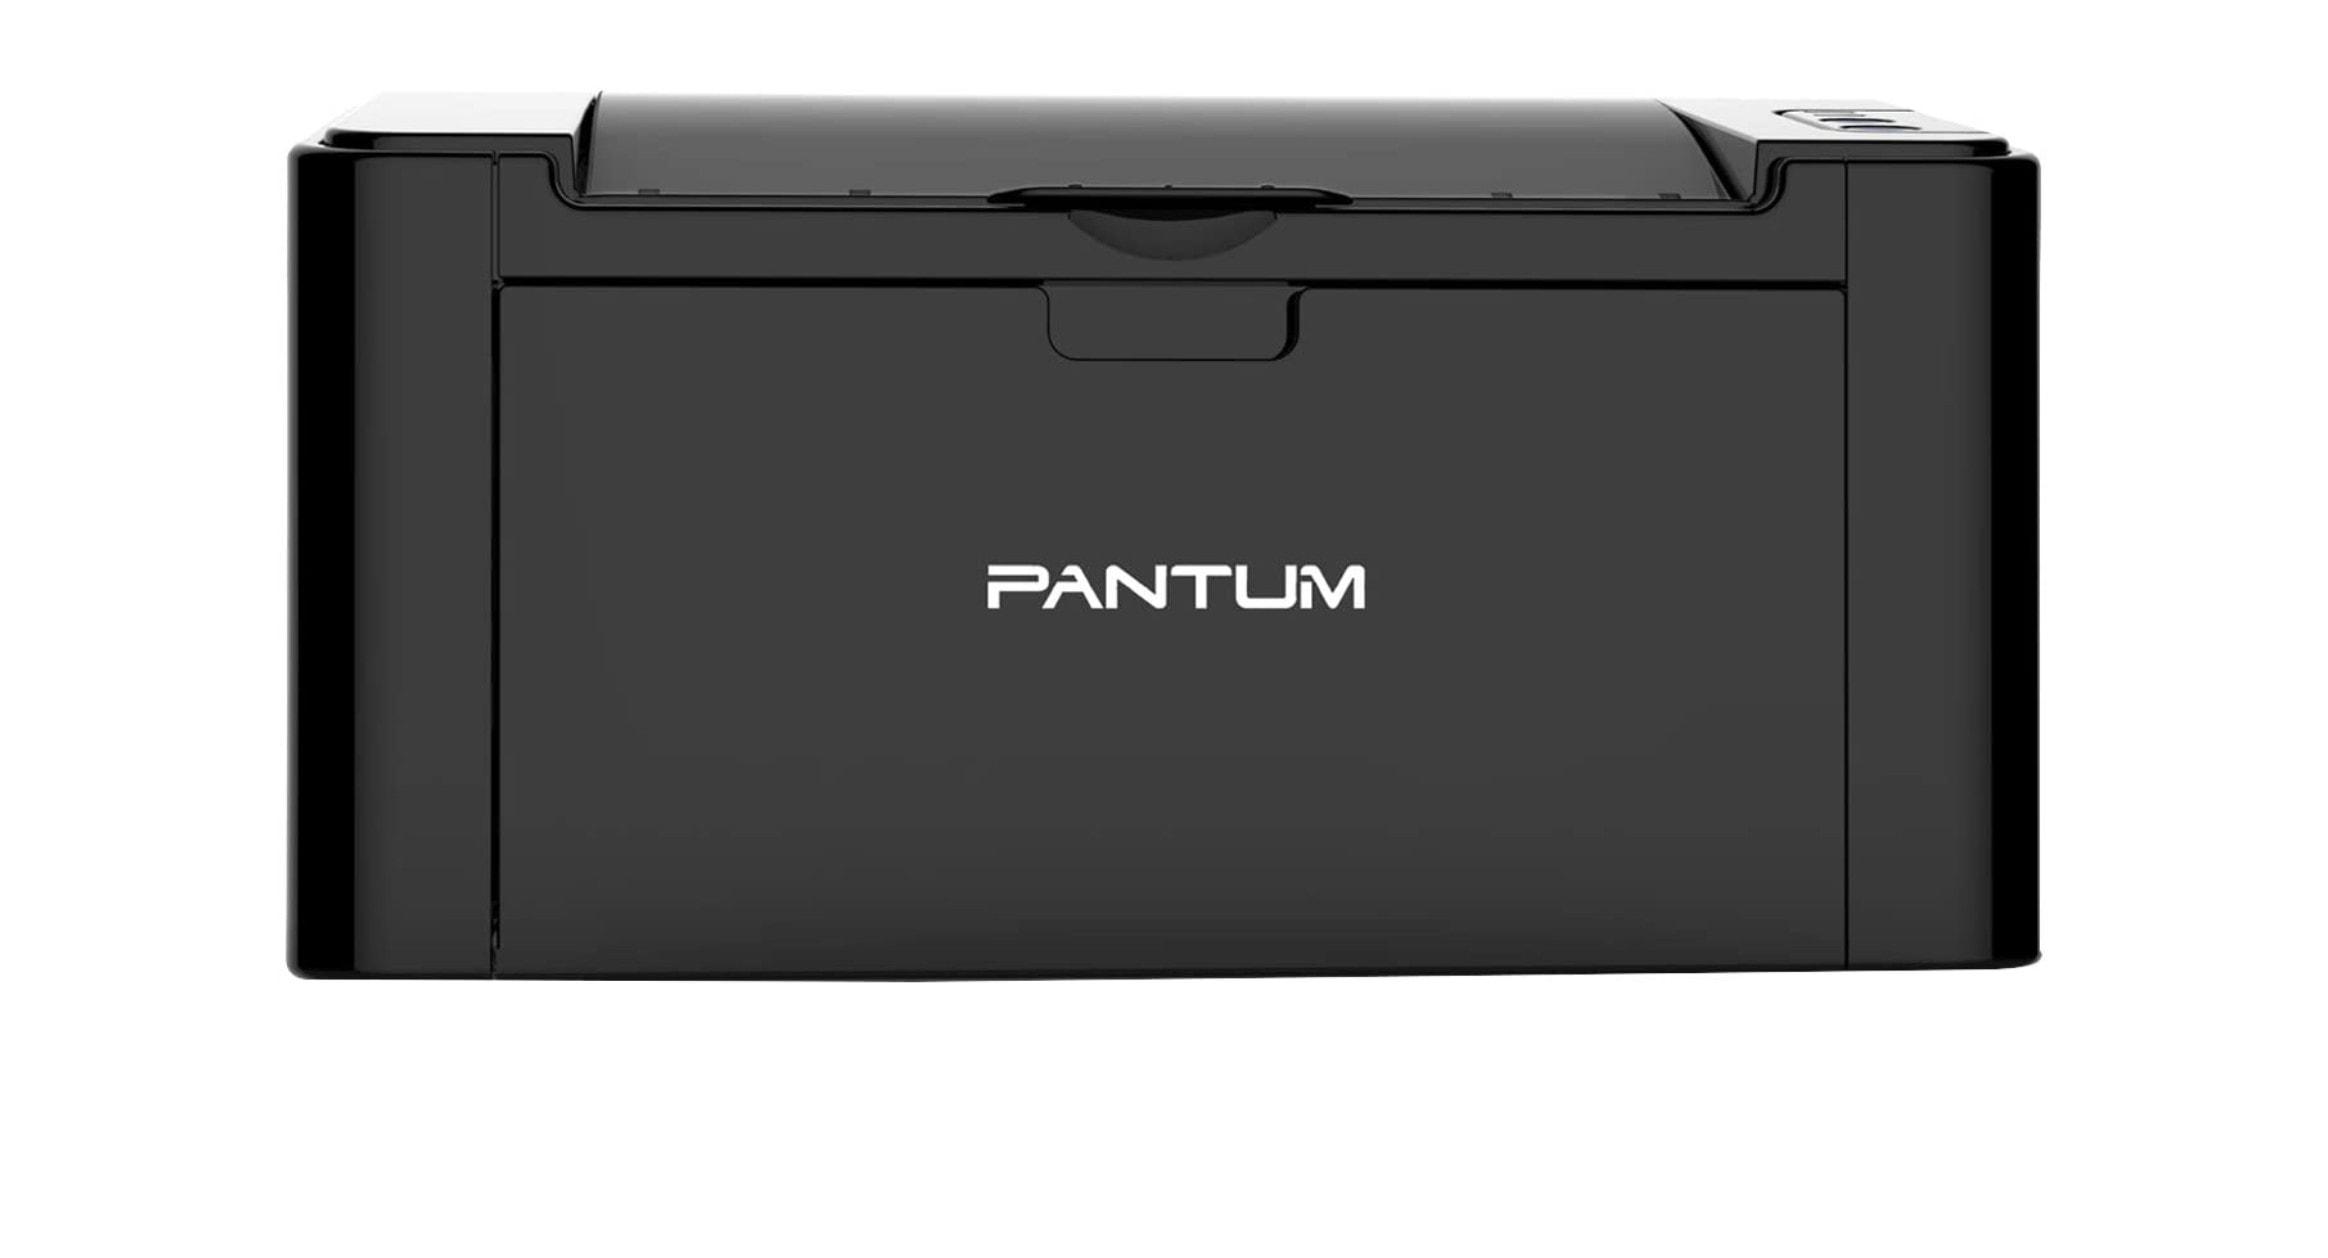 Pantum-laser-printer